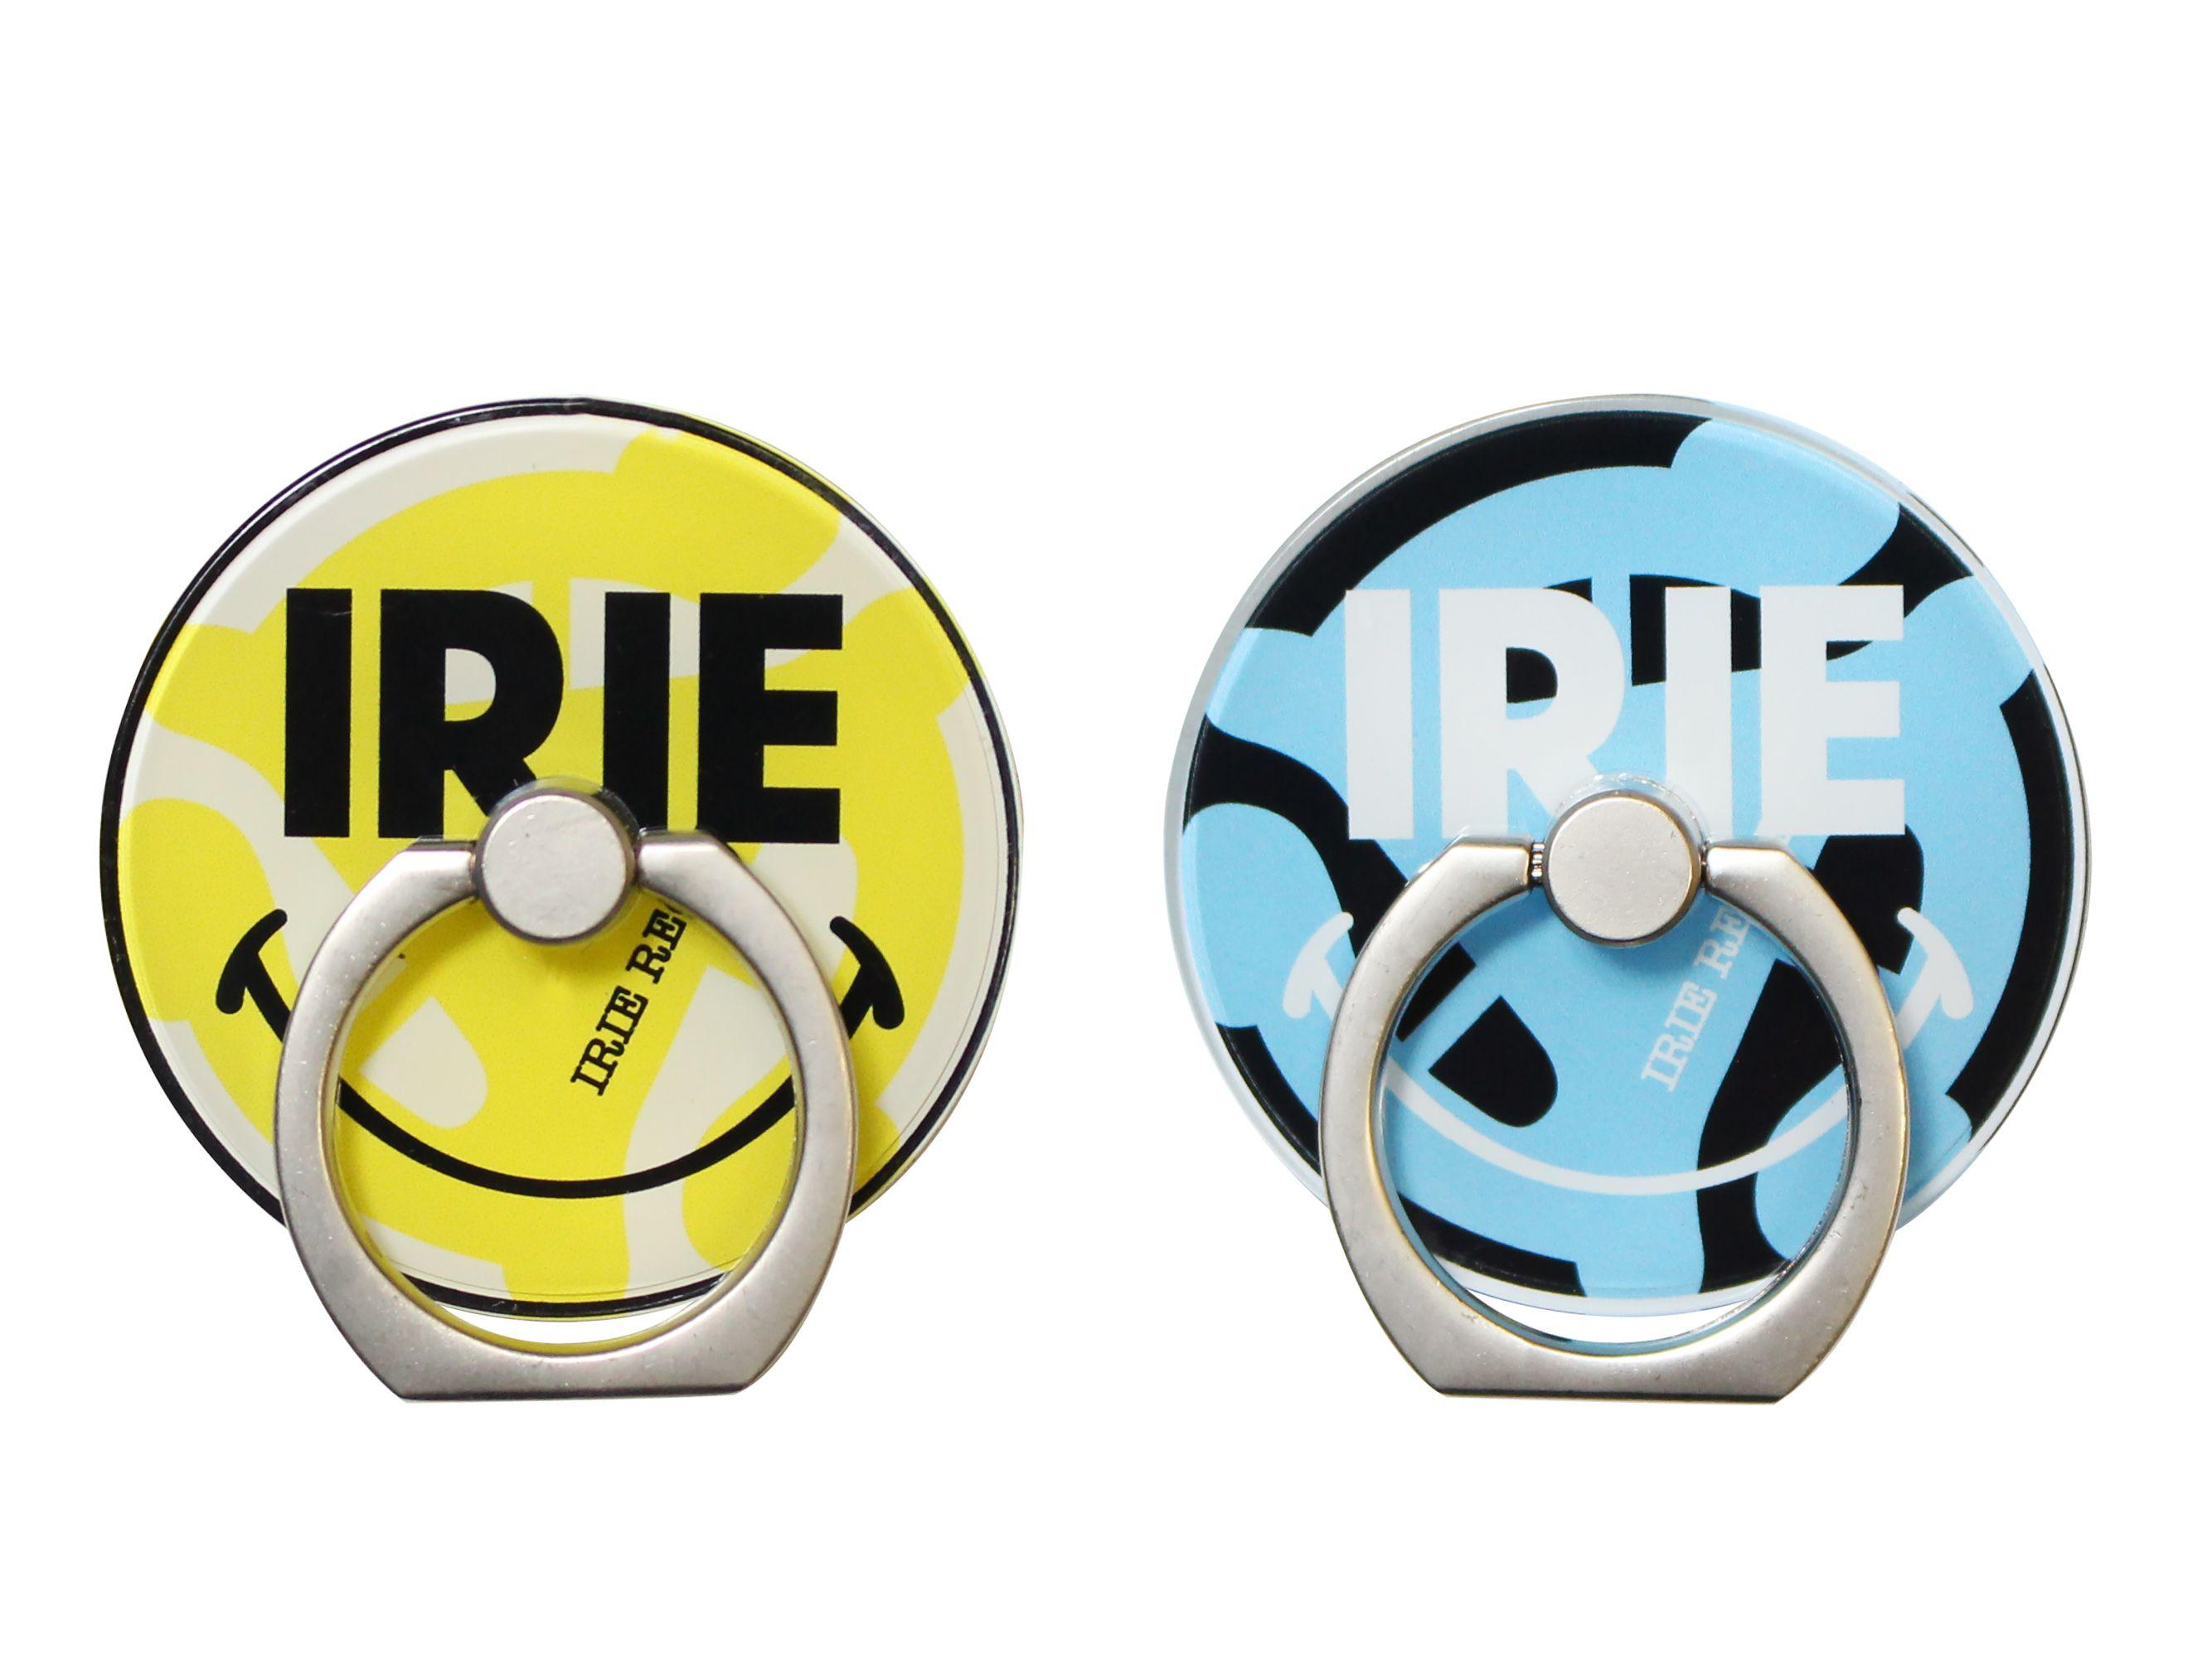 SMIRIE 45 SMARTPHONE RING -IRIEby irielife-